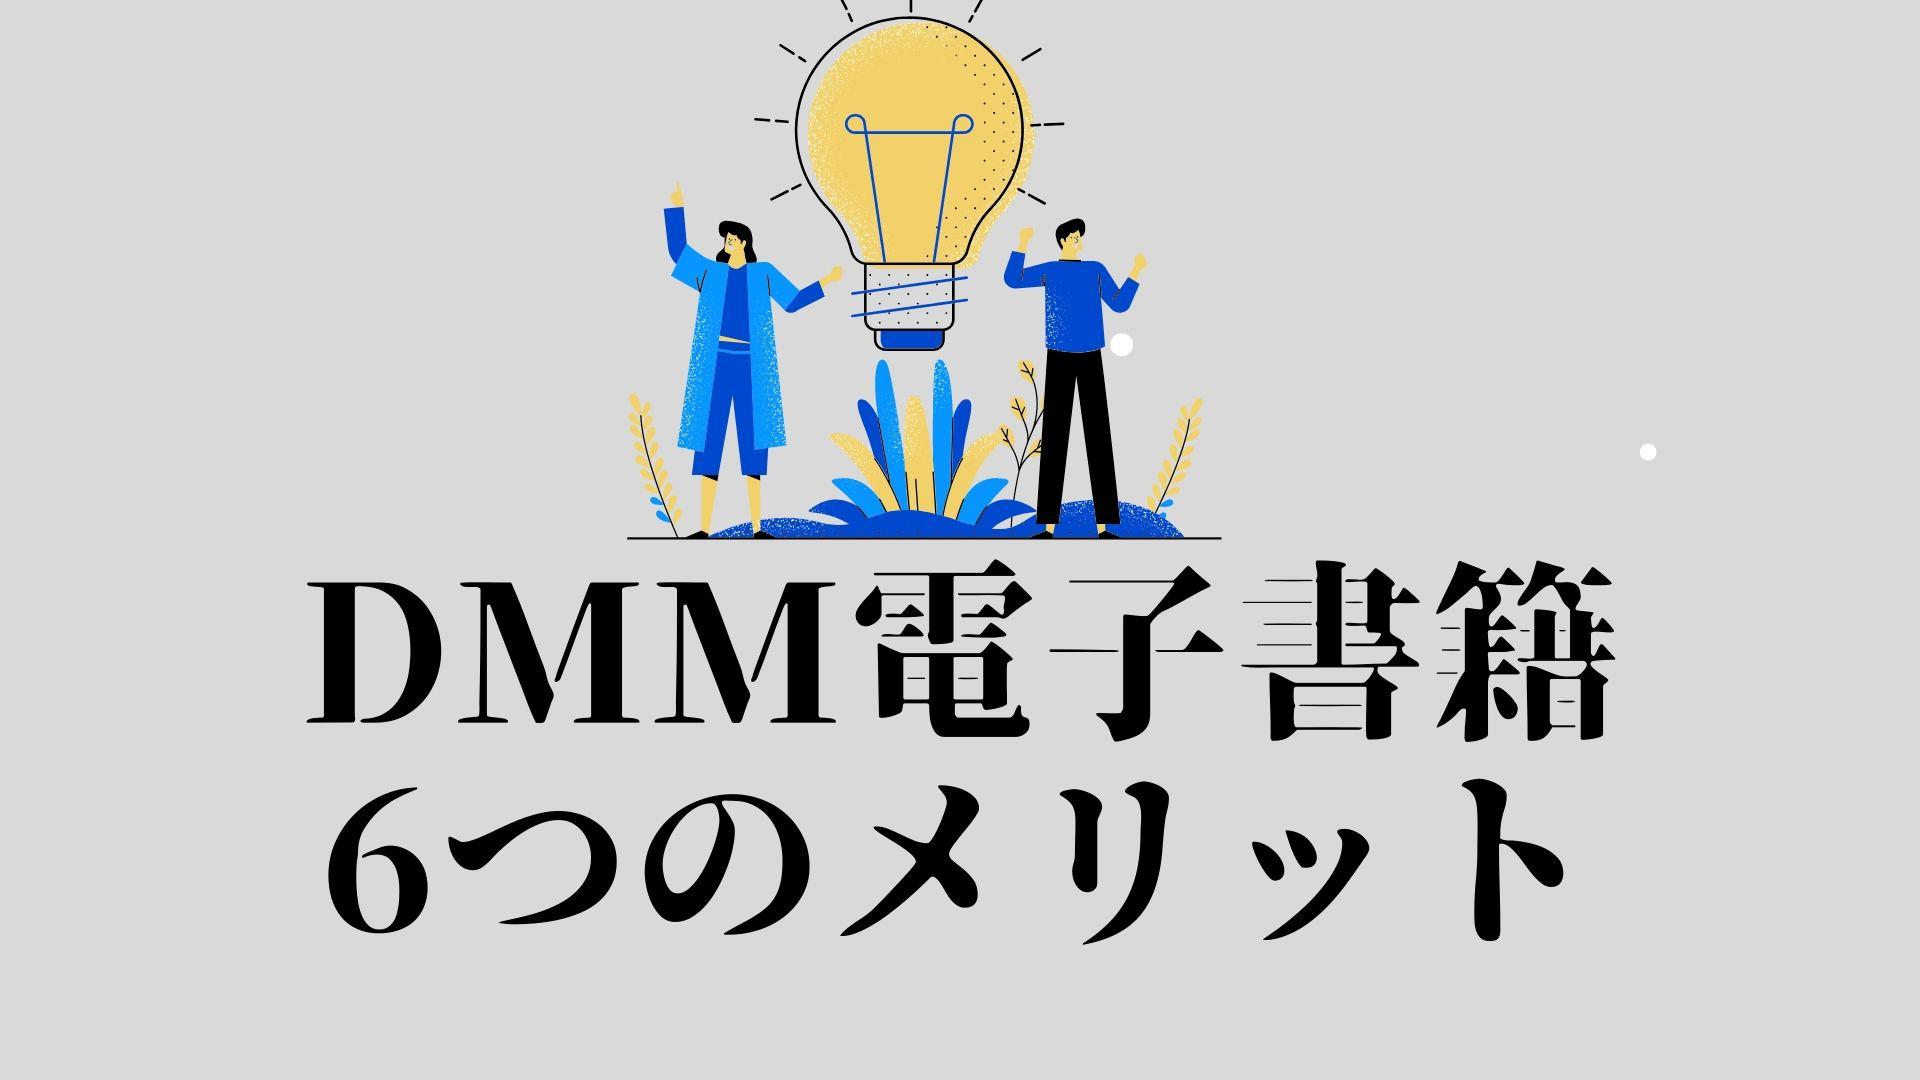 DMM電子書籍 6つのメリット